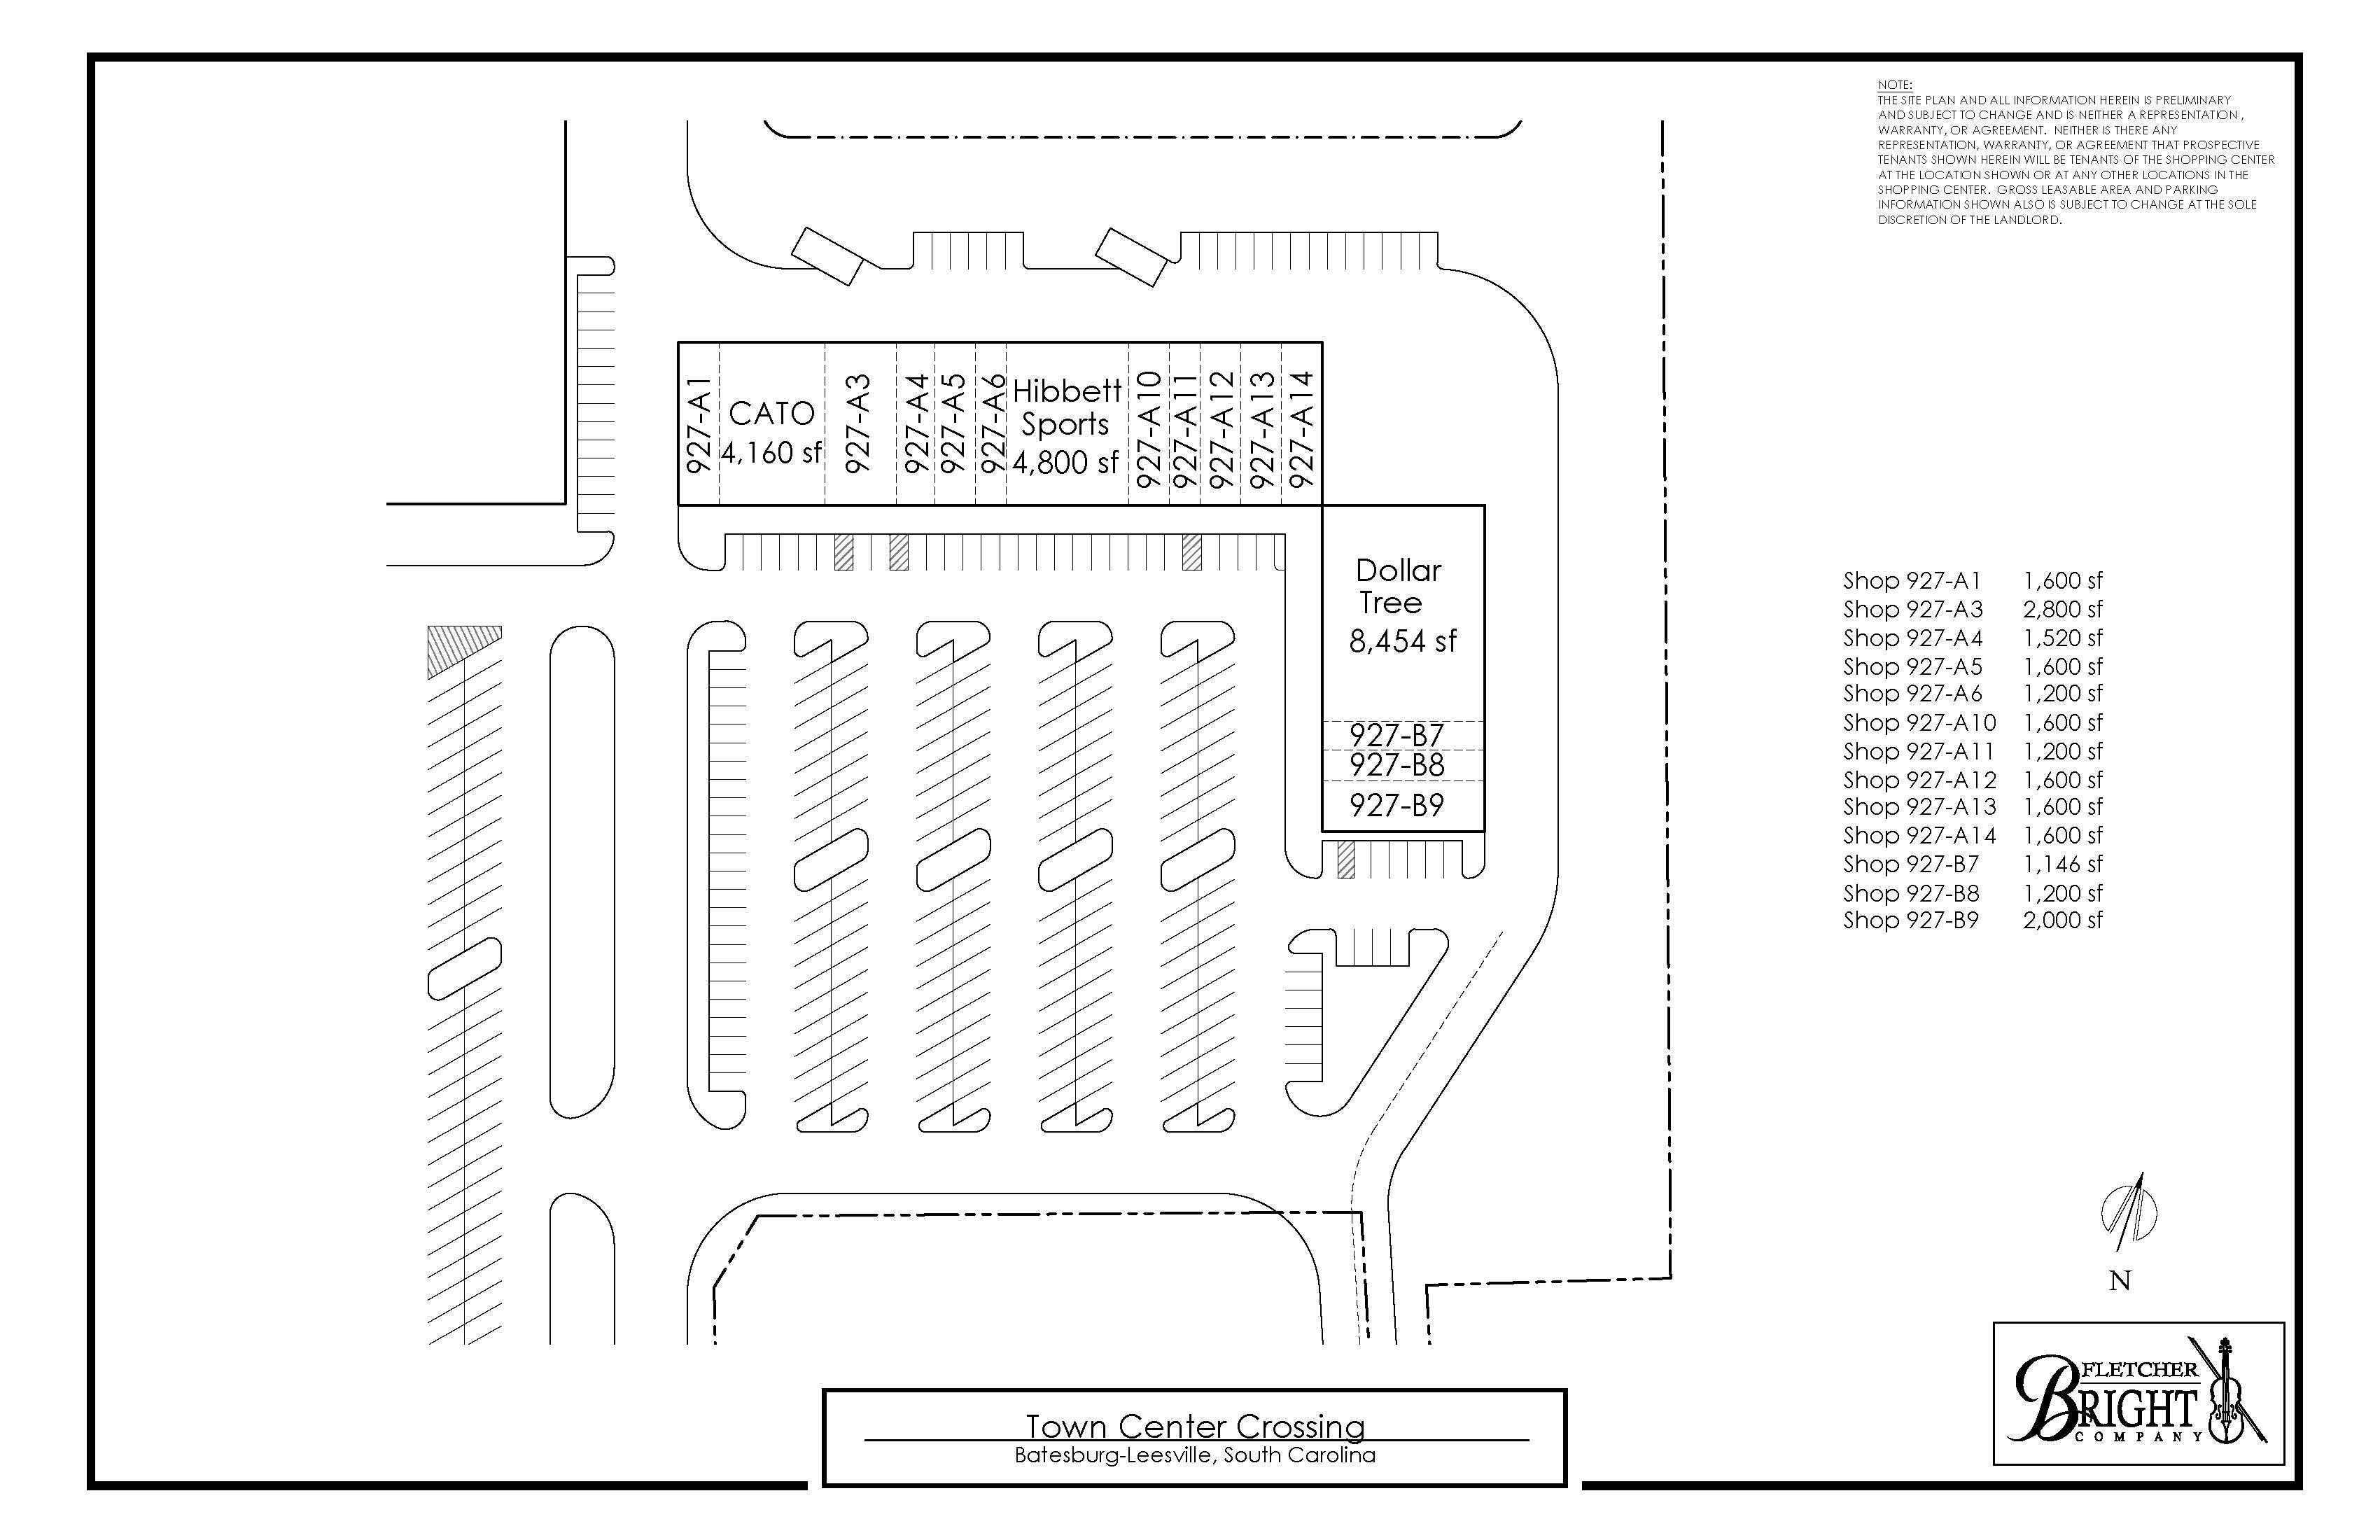 town center crossing fletcher bright. Black Bedroom Furniture Sets. Home Design Ideas